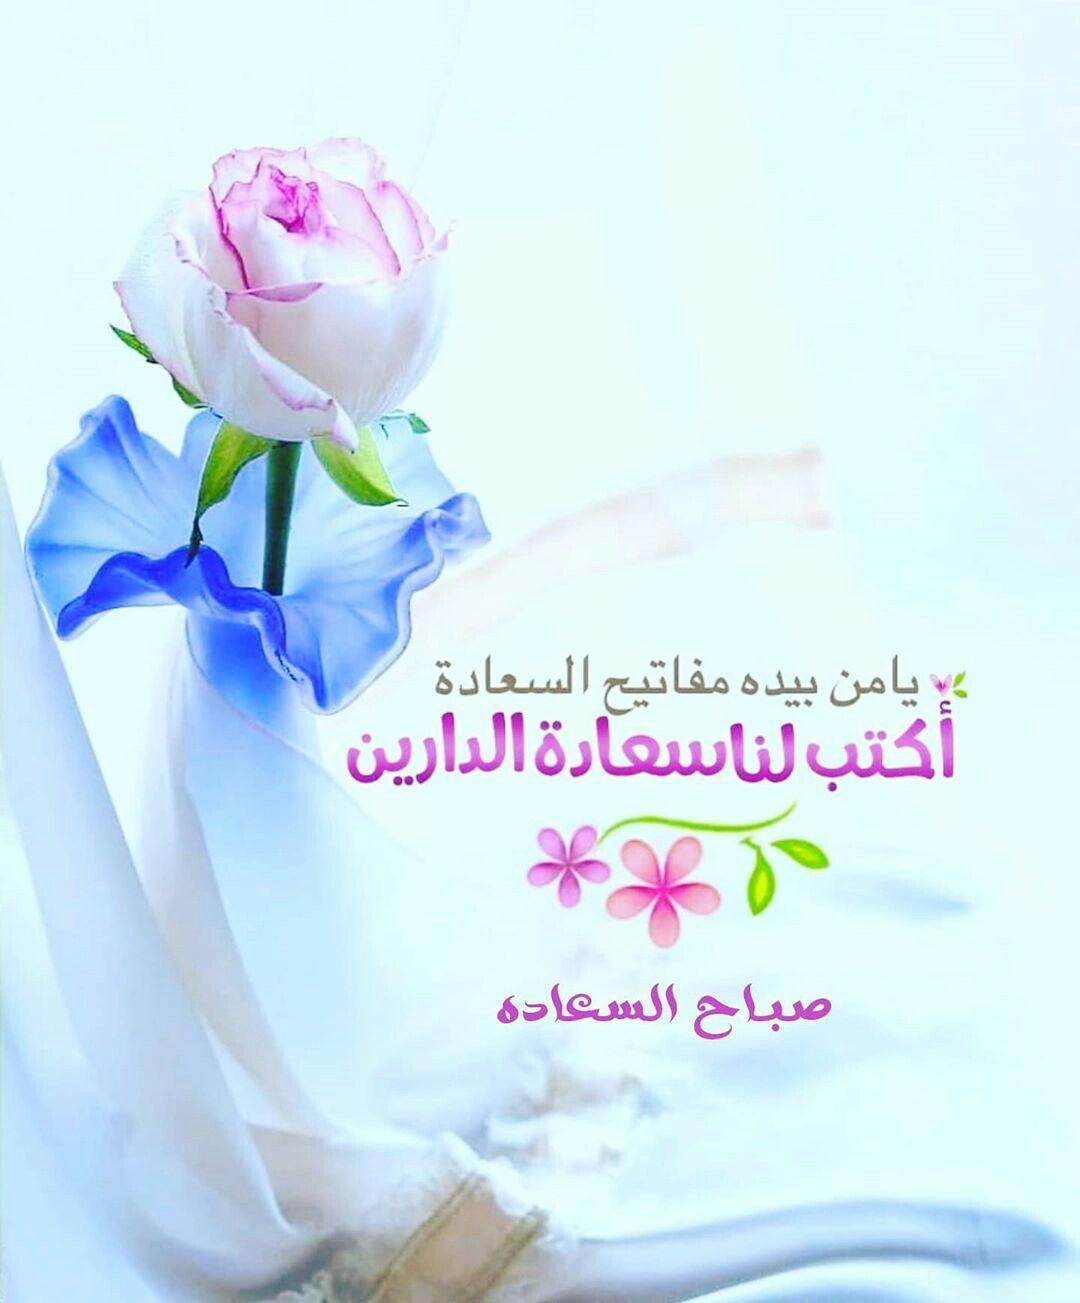 Pin By الصحبة الطيبة On صباحيات Good Morning Arabic Romantic Love Quotes Morning Quotes